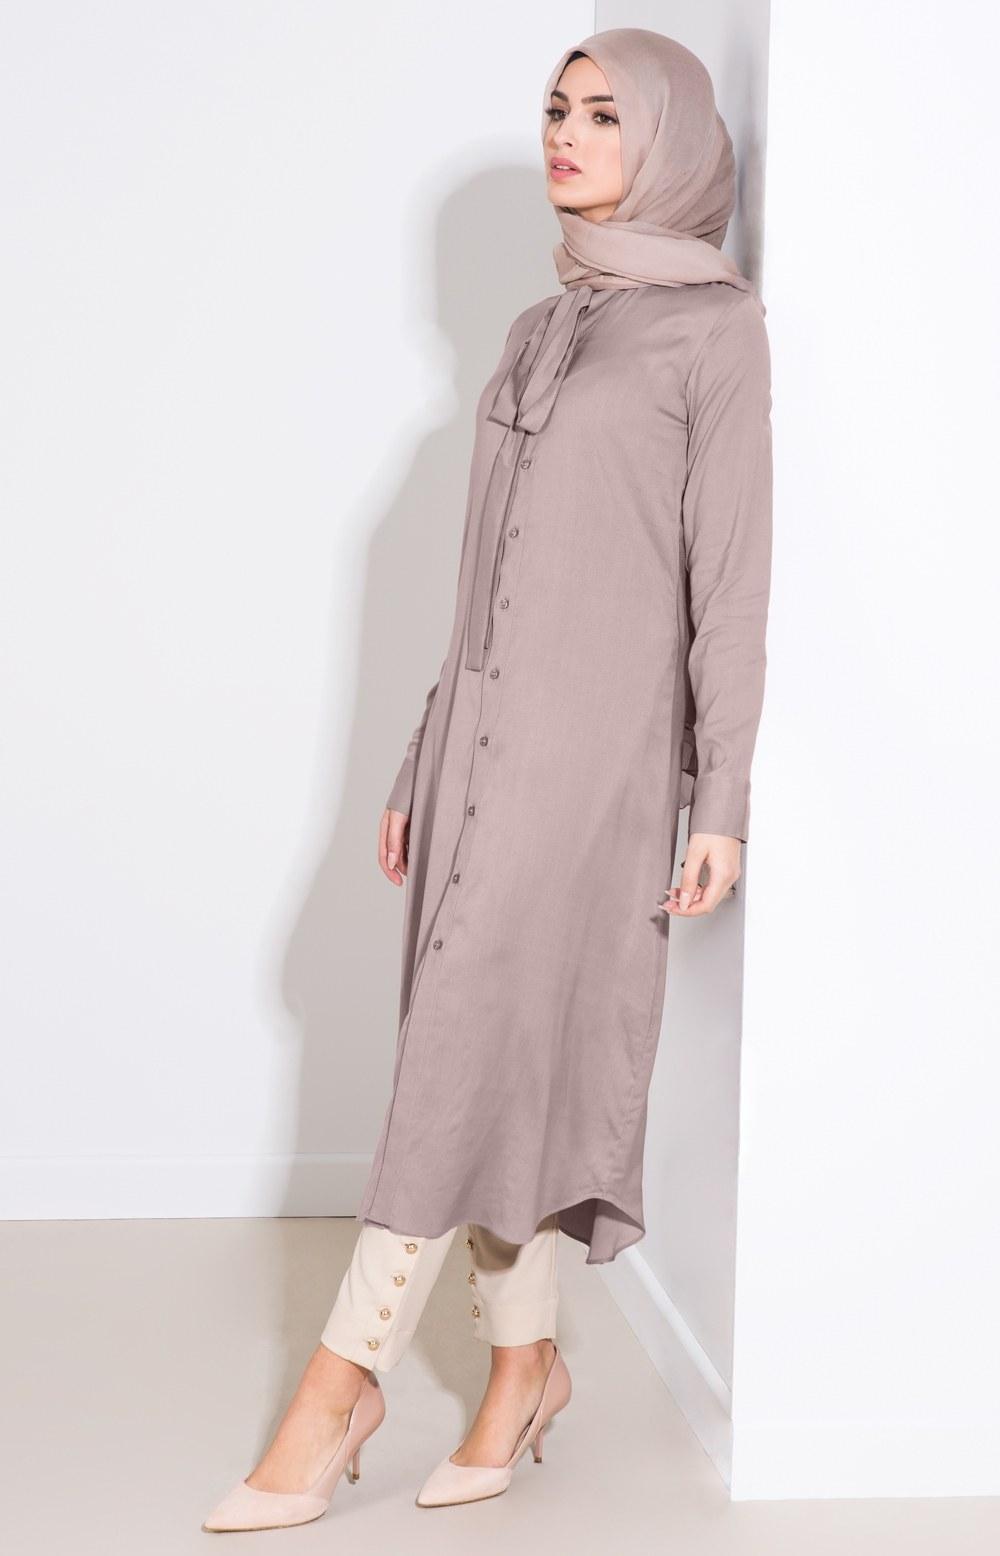 Bentuk Baju Lebaran Model Baru H9d9 25 Trend Model Baju Muslim Lebaran 2018 Simple & Modis